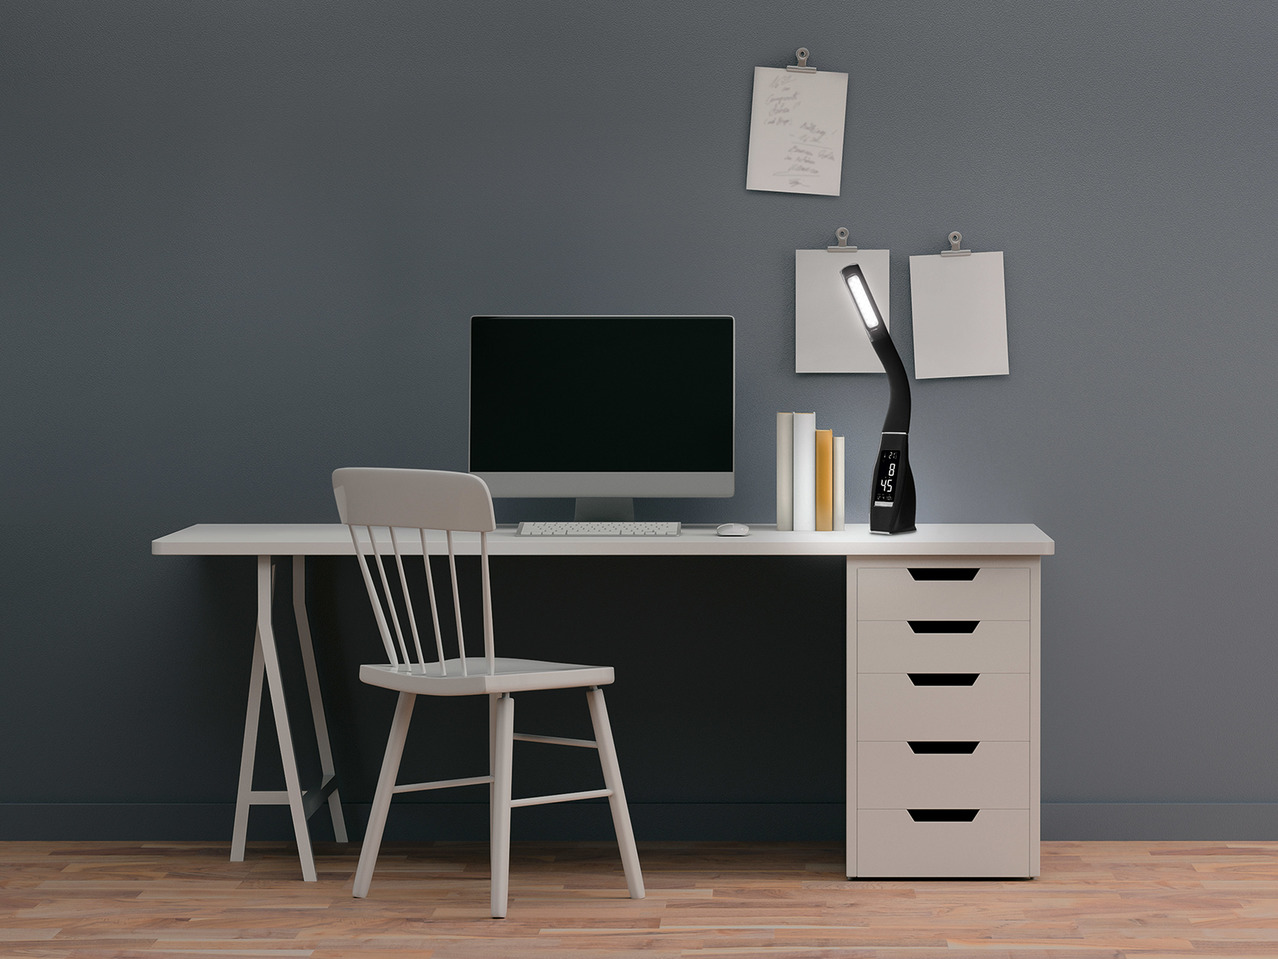 Livarno Lux Led Desk Lamp1 Lidl Great Britain